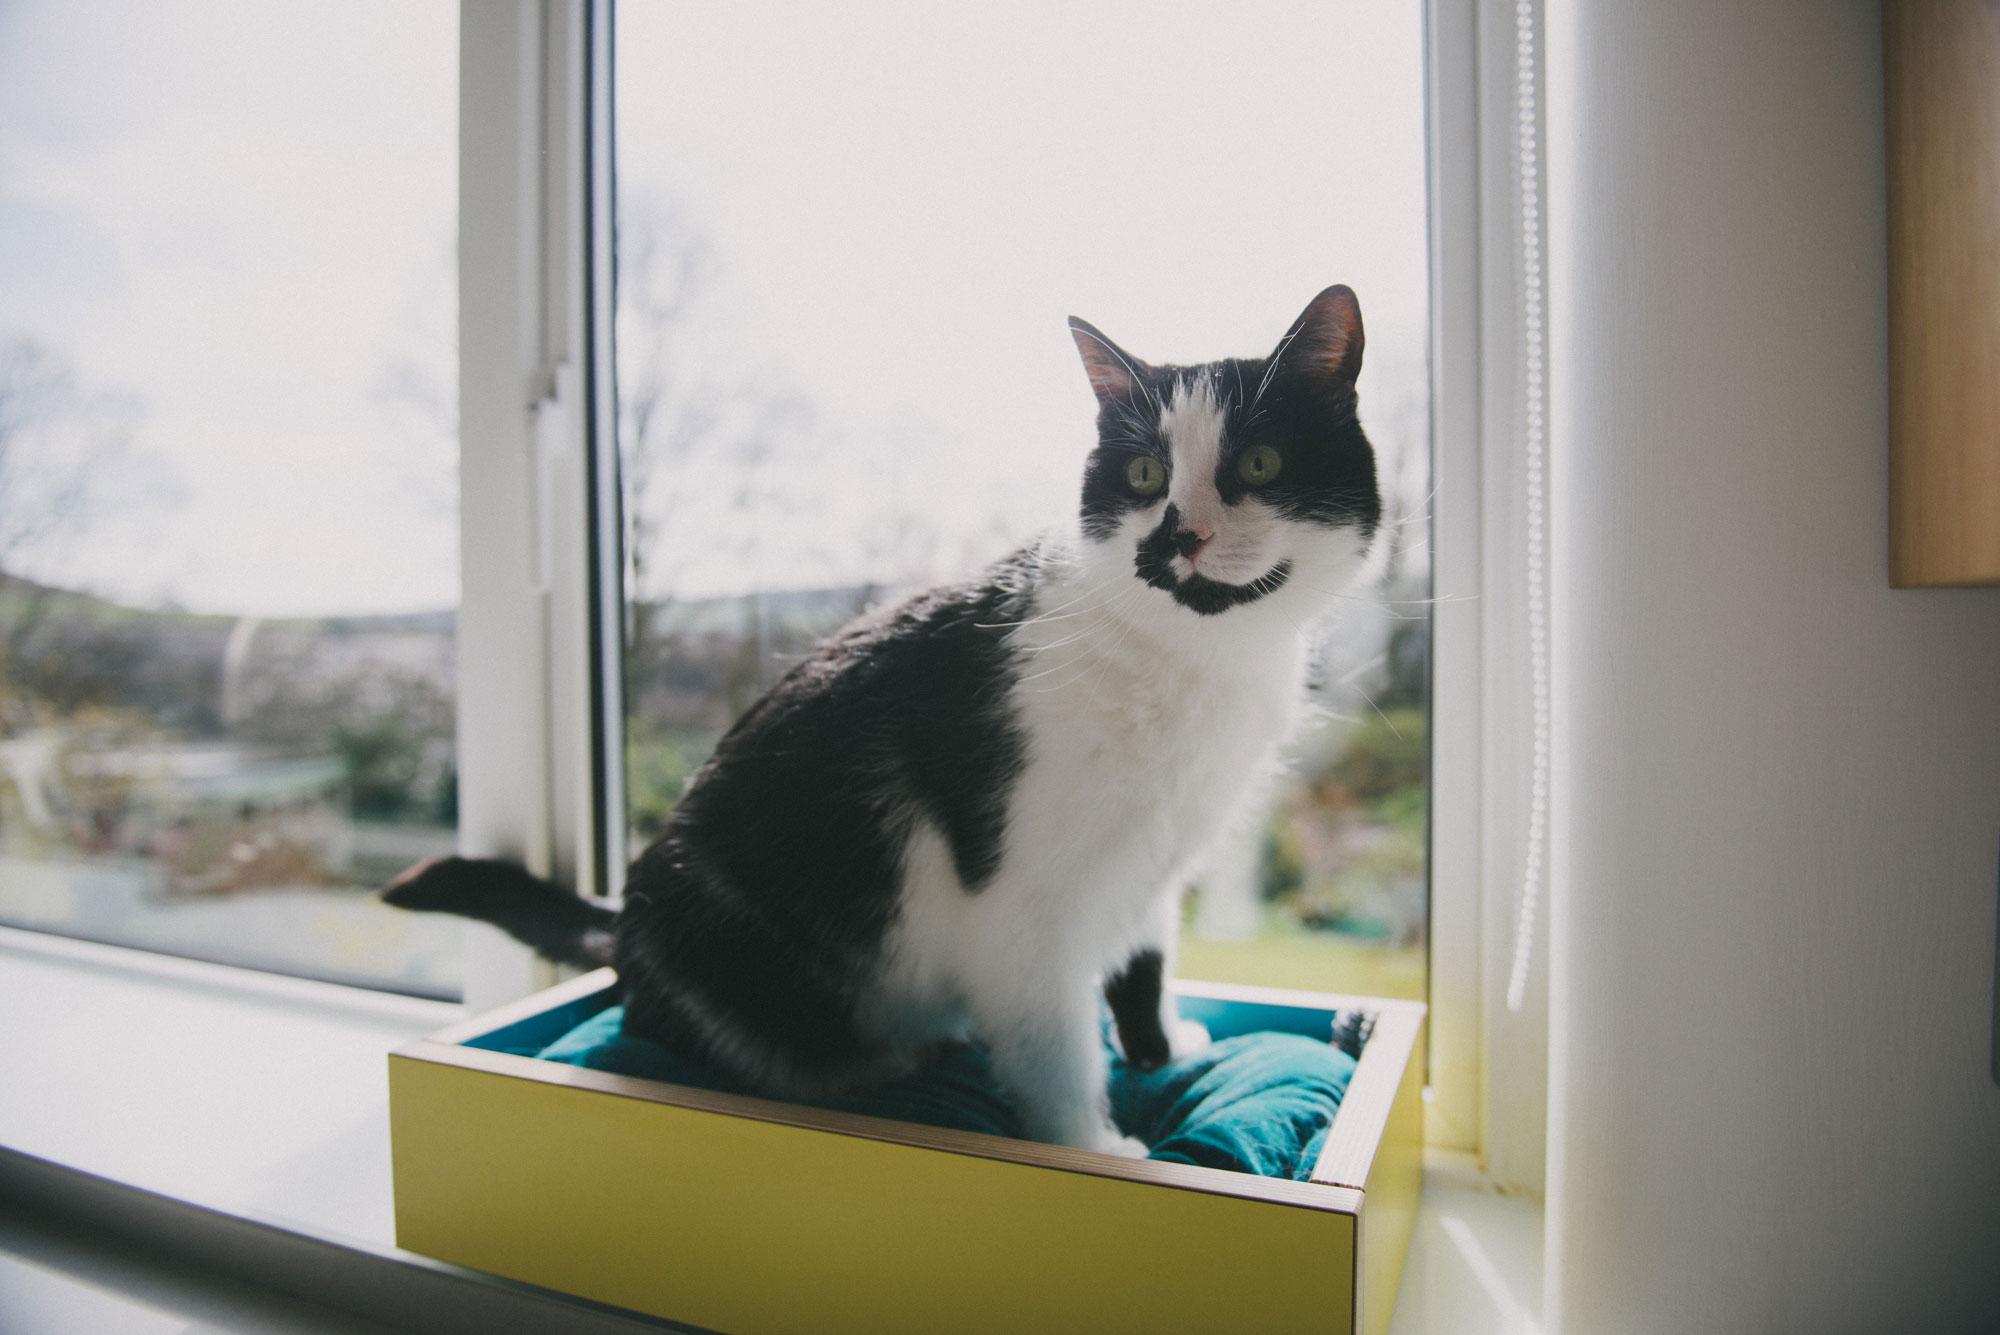 Cat sat in bespoke plywood window box